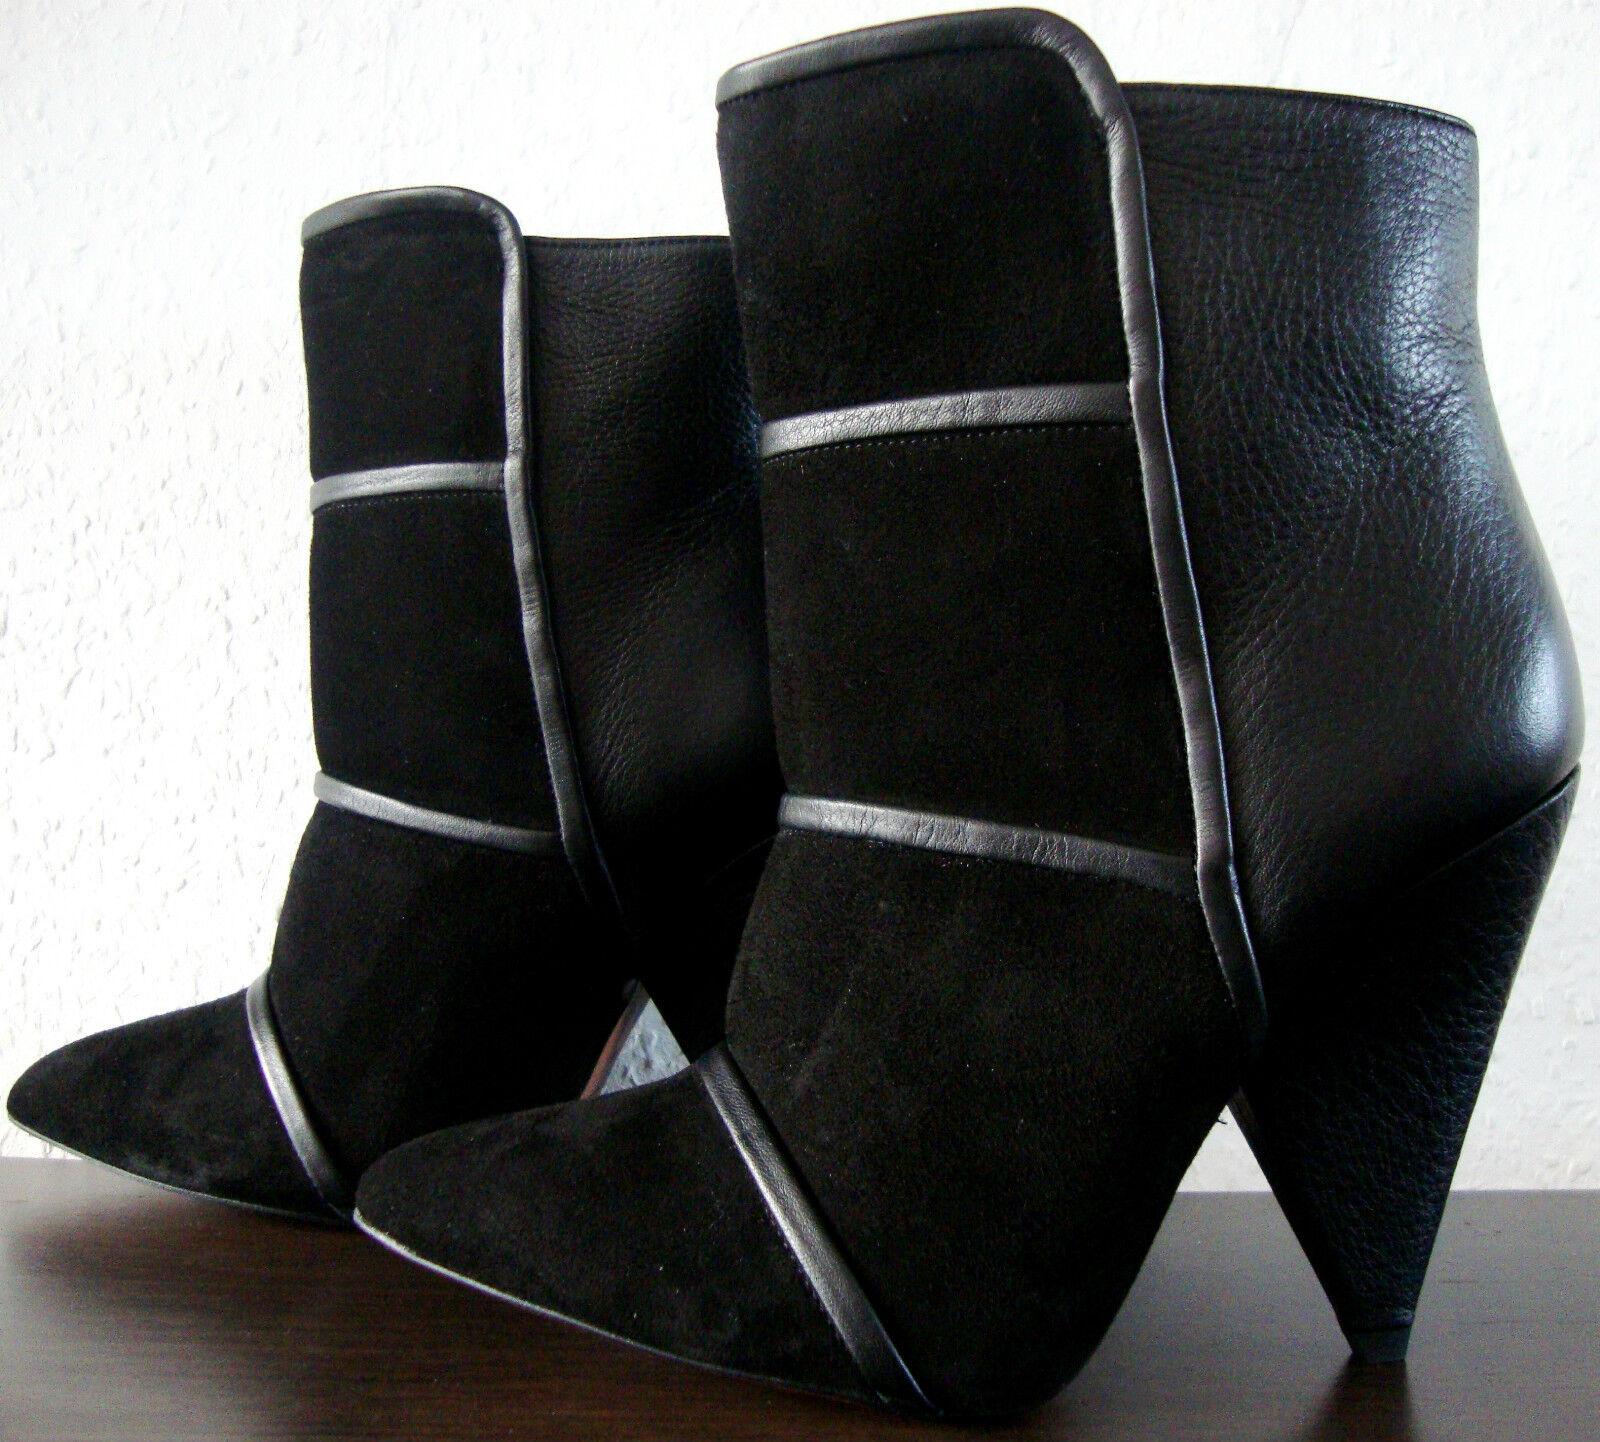 IRO Bottines En Cuir Bottines montante Designer Chaussures montante Bottines Black taille 36 NEUF c6c6f8